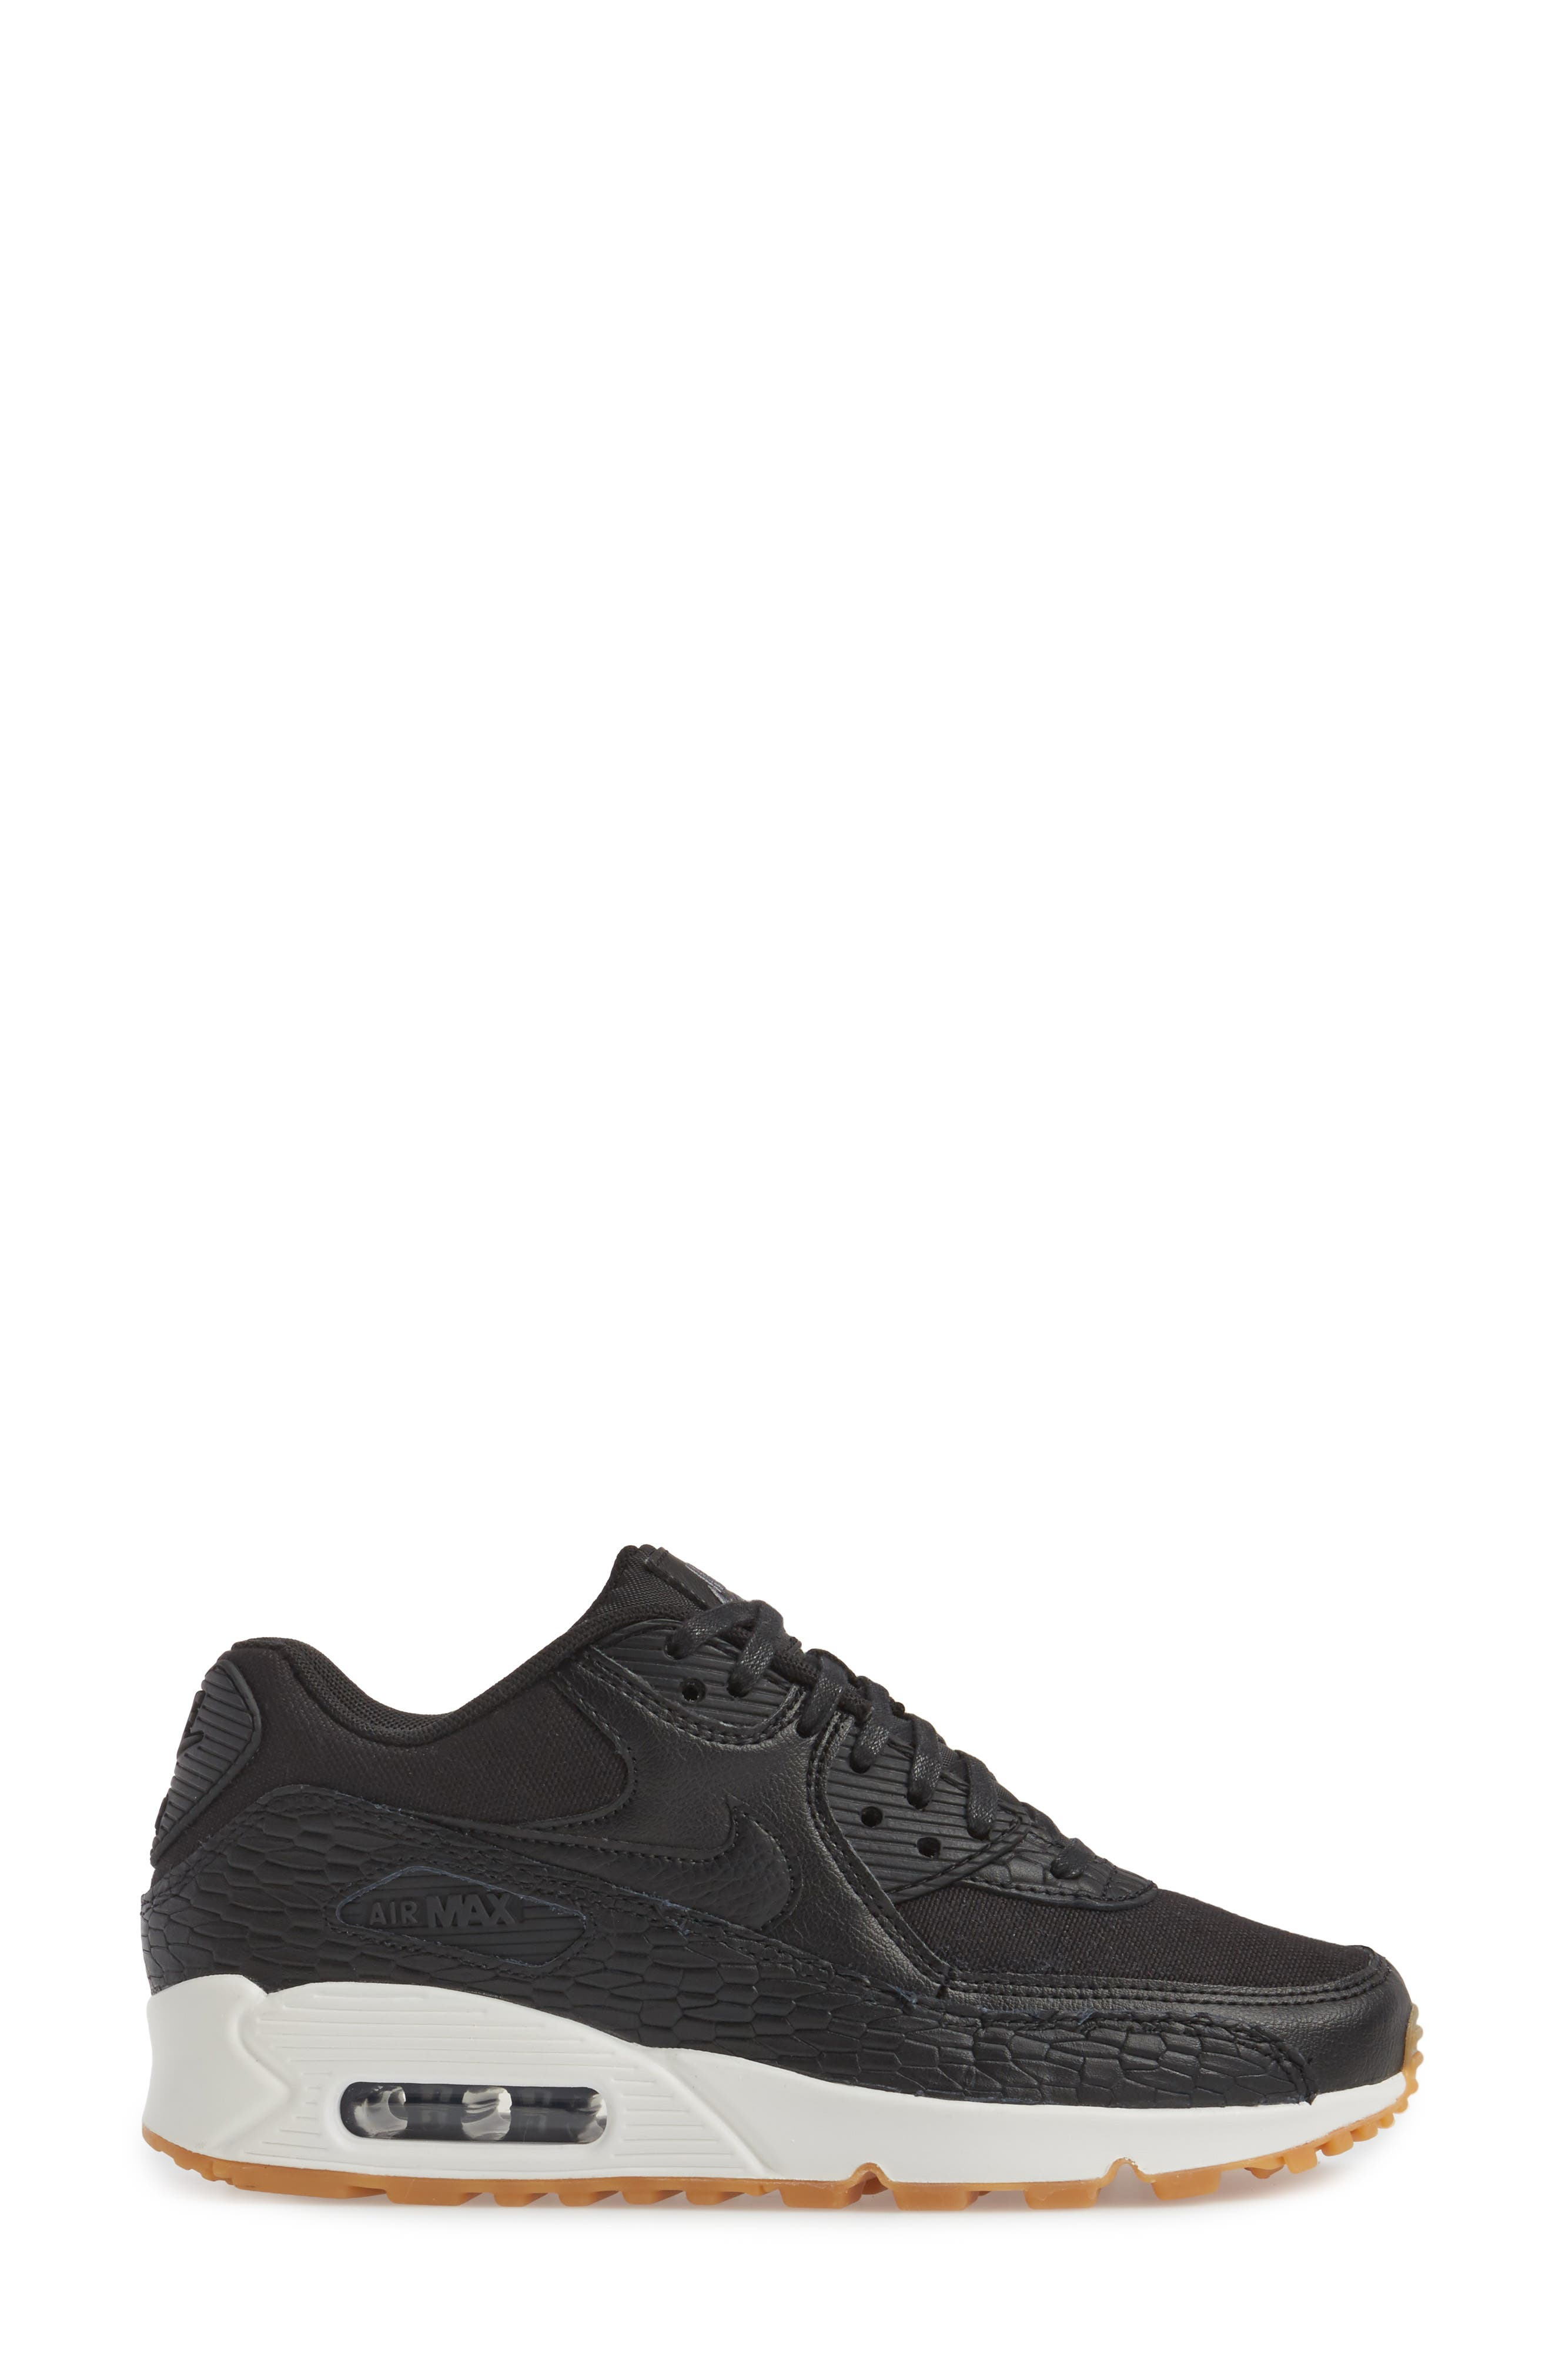 Air Max 90 Premium Leather Sneaker,                             Alternate thumbnail 3, color,                             Black/ Dark Grey/ Ivory